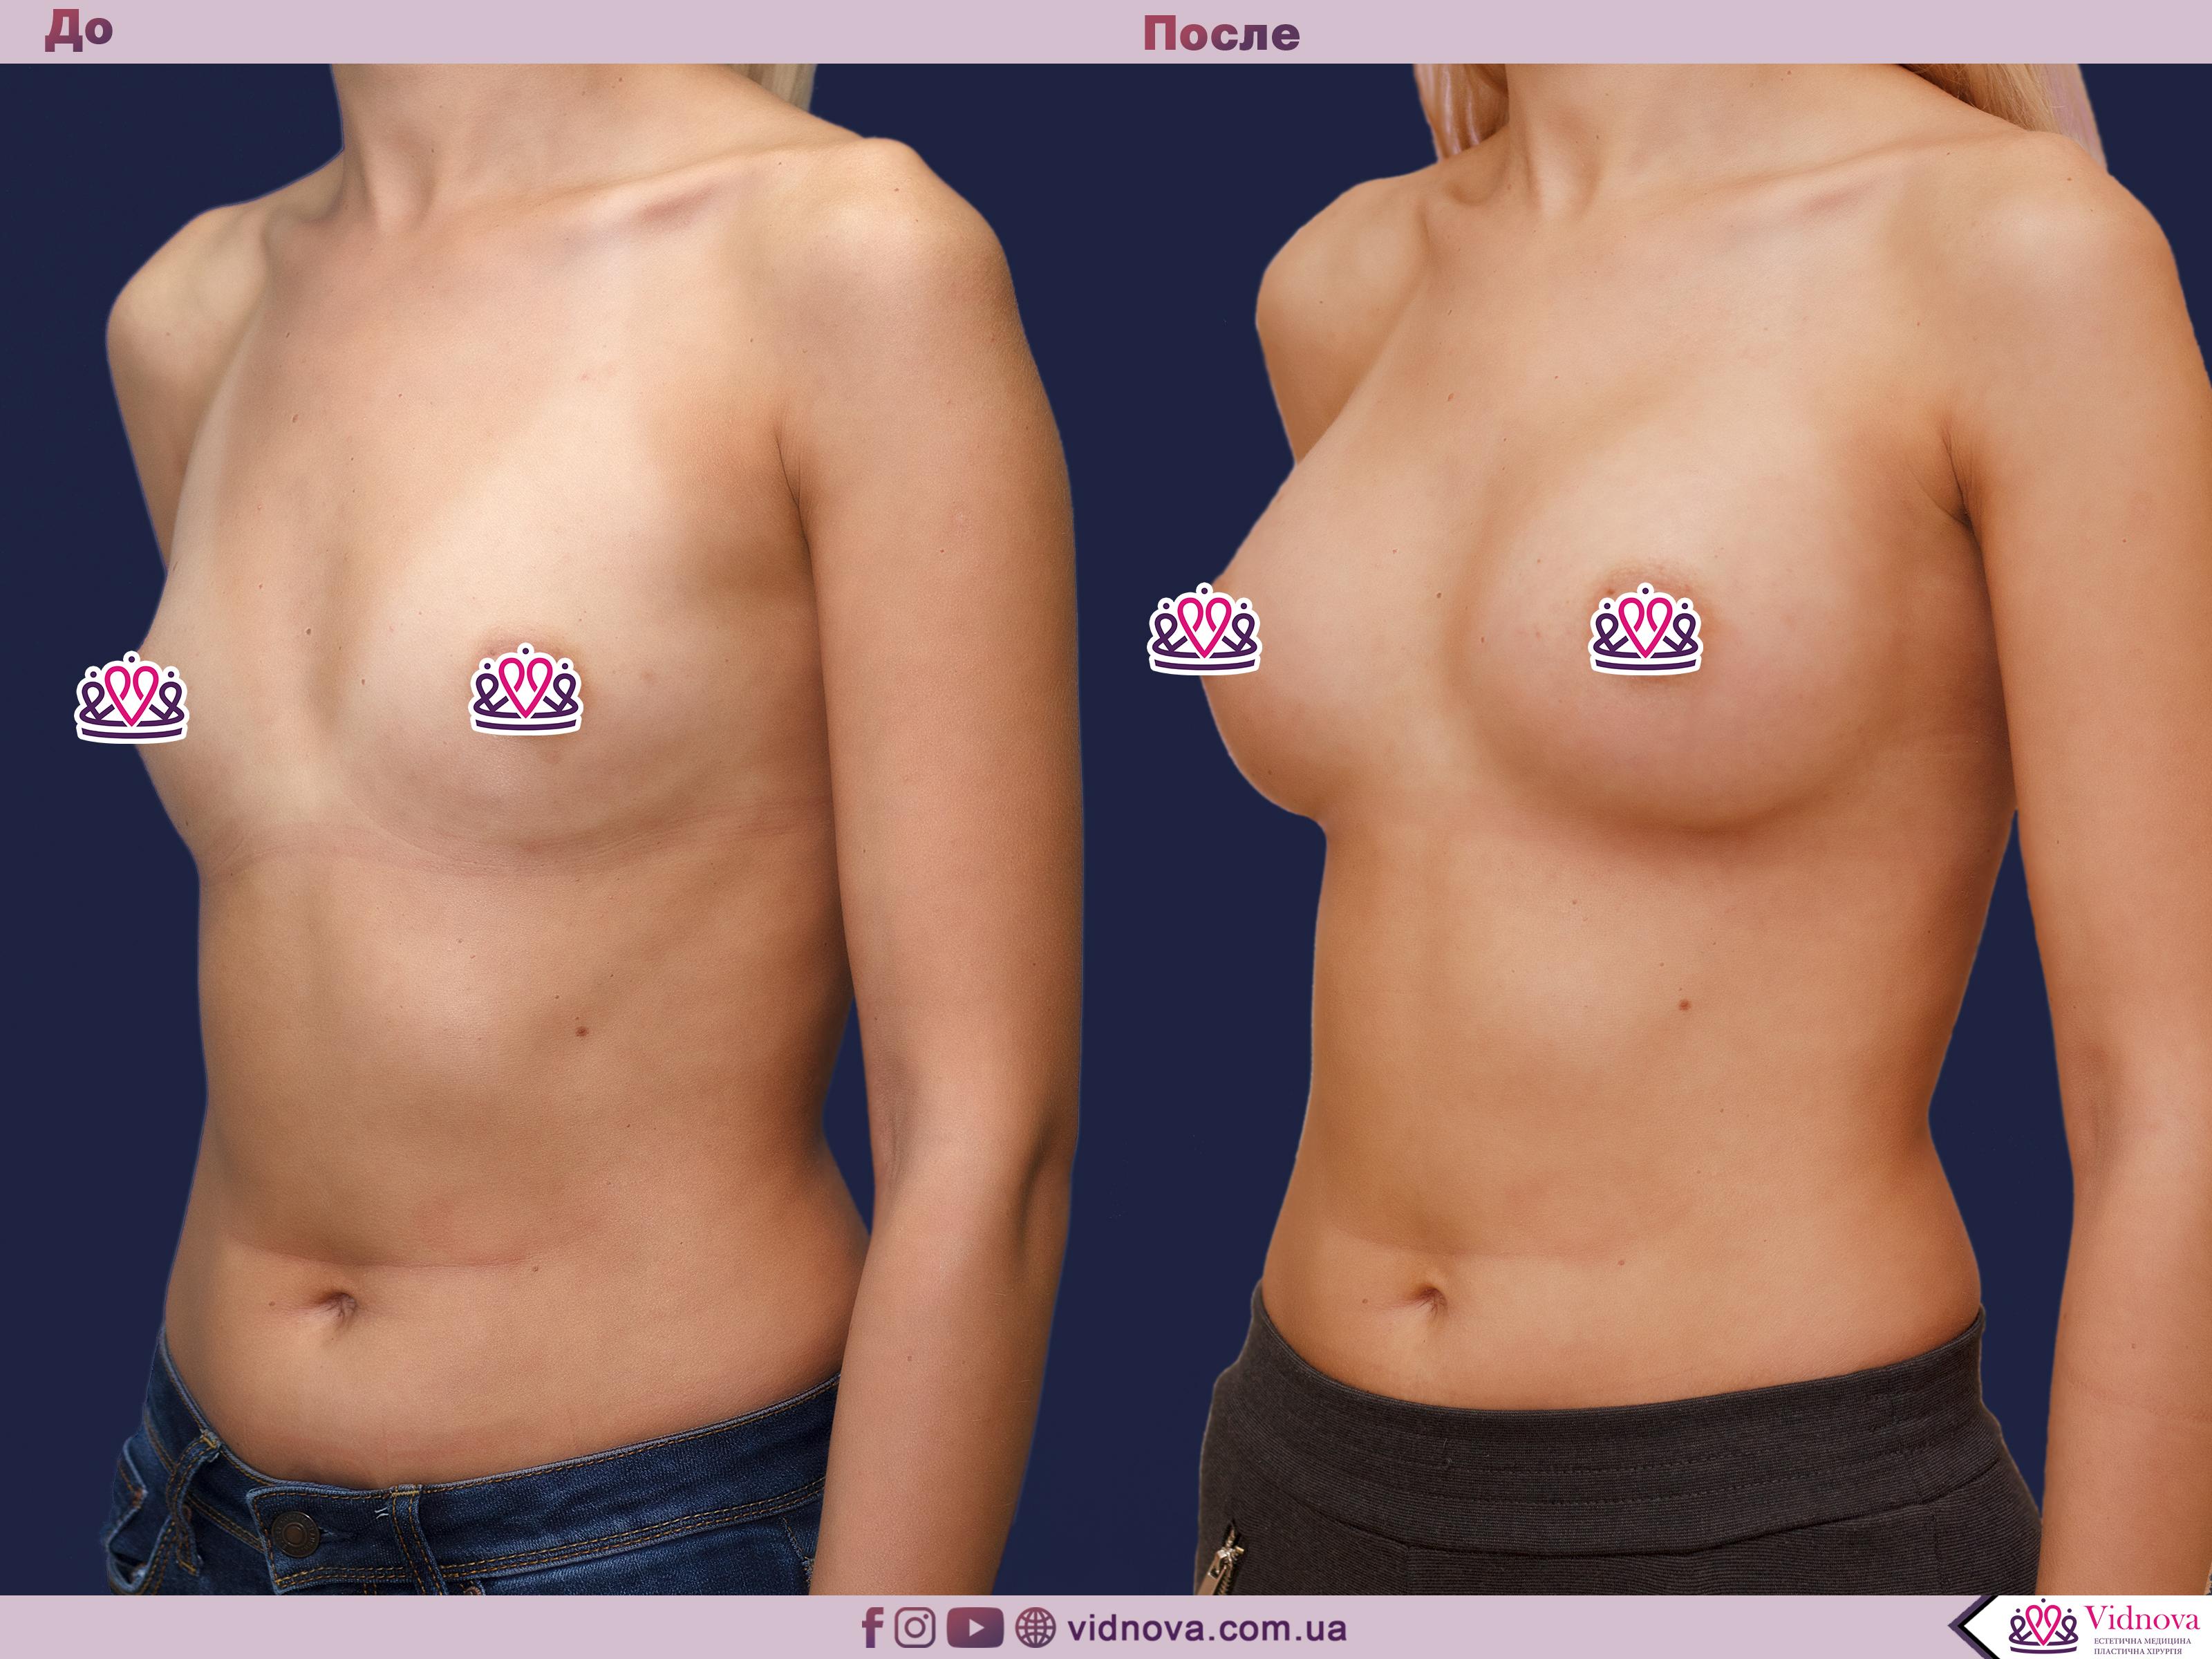 Увеличение груди: Фото ДО и ПОСЛЕ - Пример №67-2 - Клиника Vidnova